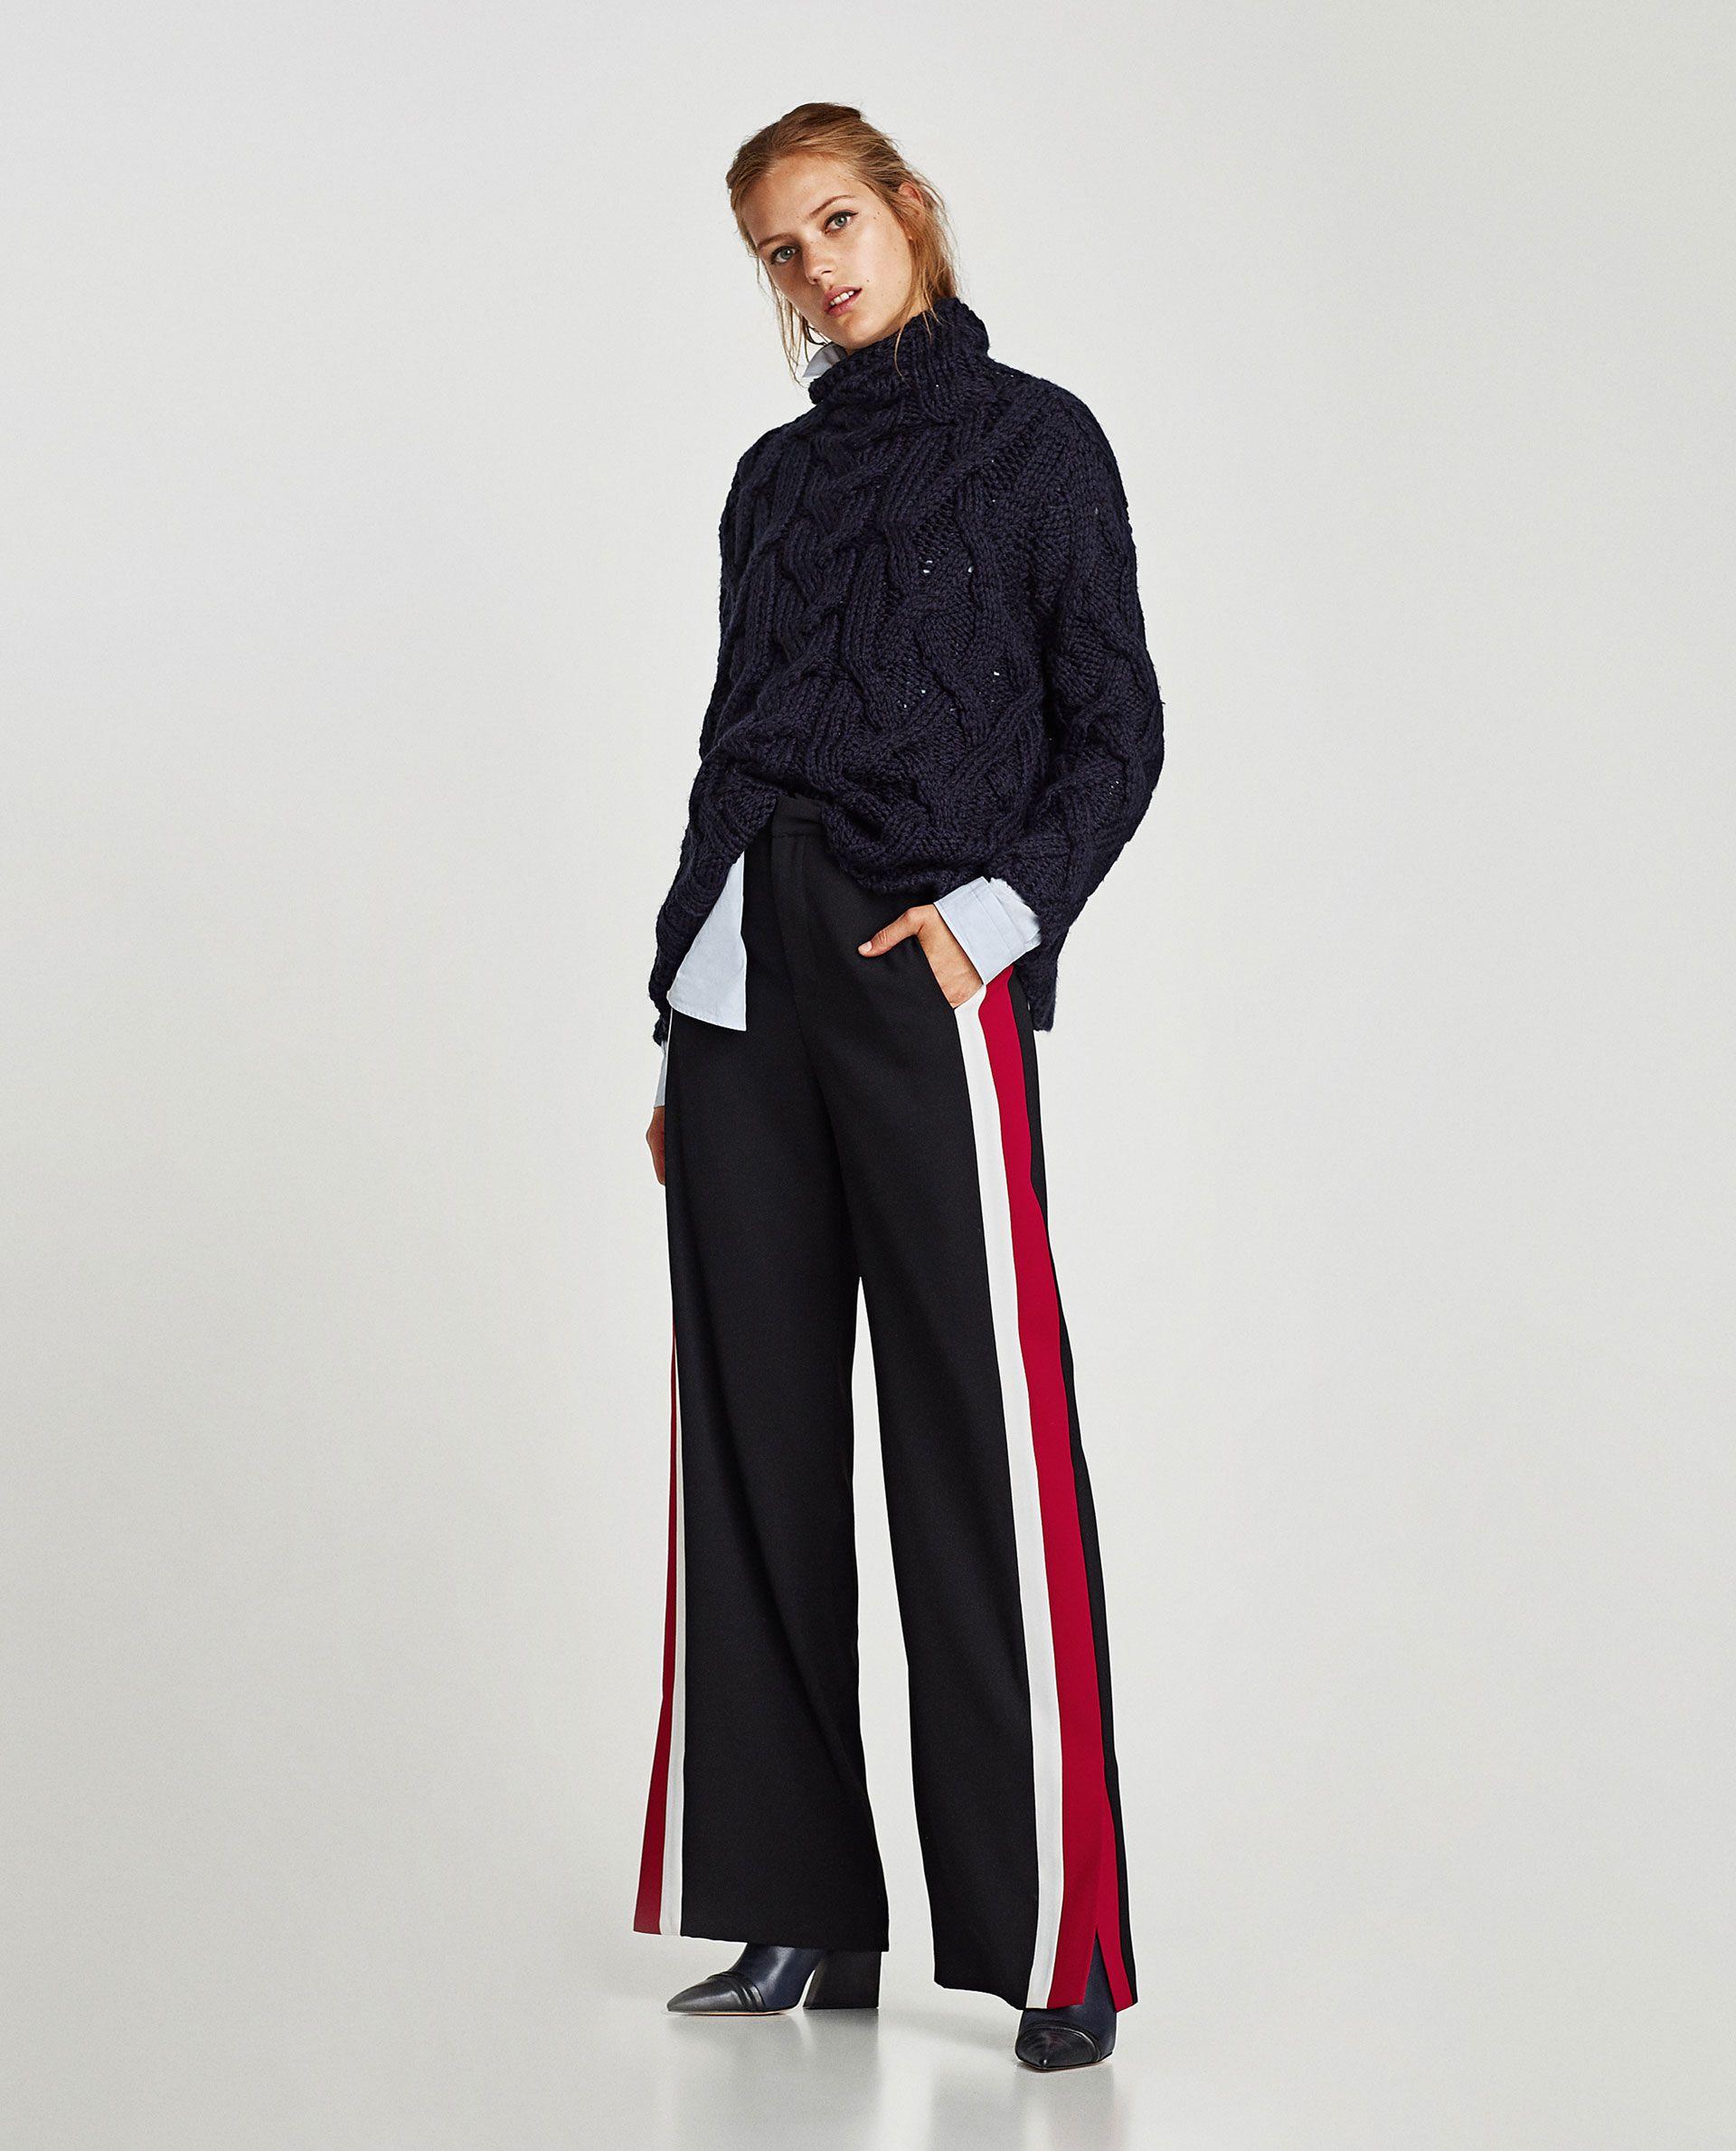 Pantalon Banda Lateral Hosen Damen Damenhosen Hosen Frauen